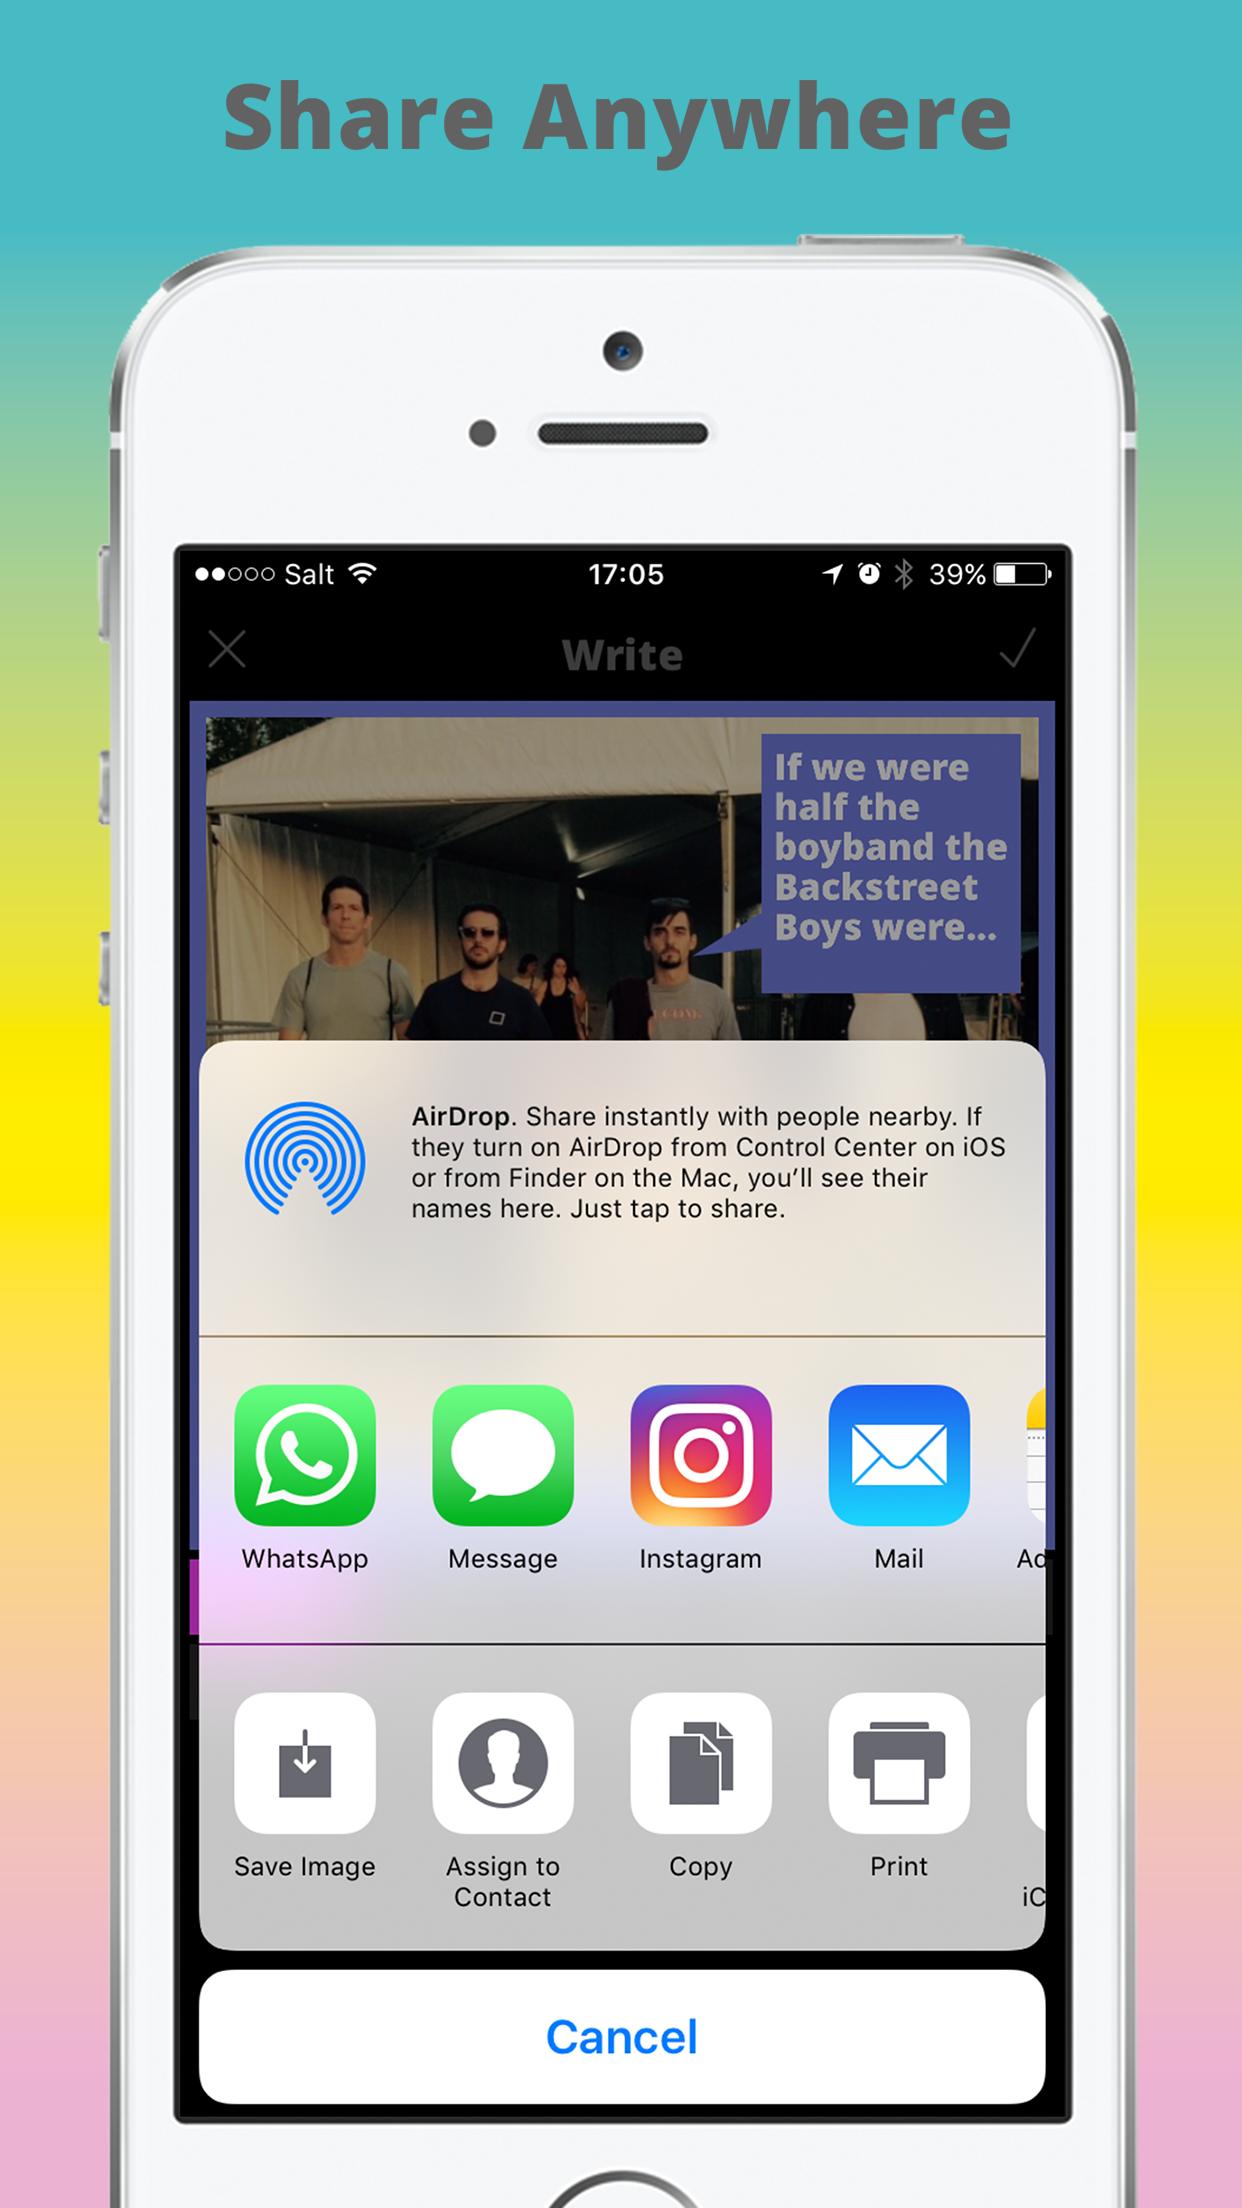 Bubblegum_AppStore_Screenshots_55in_D